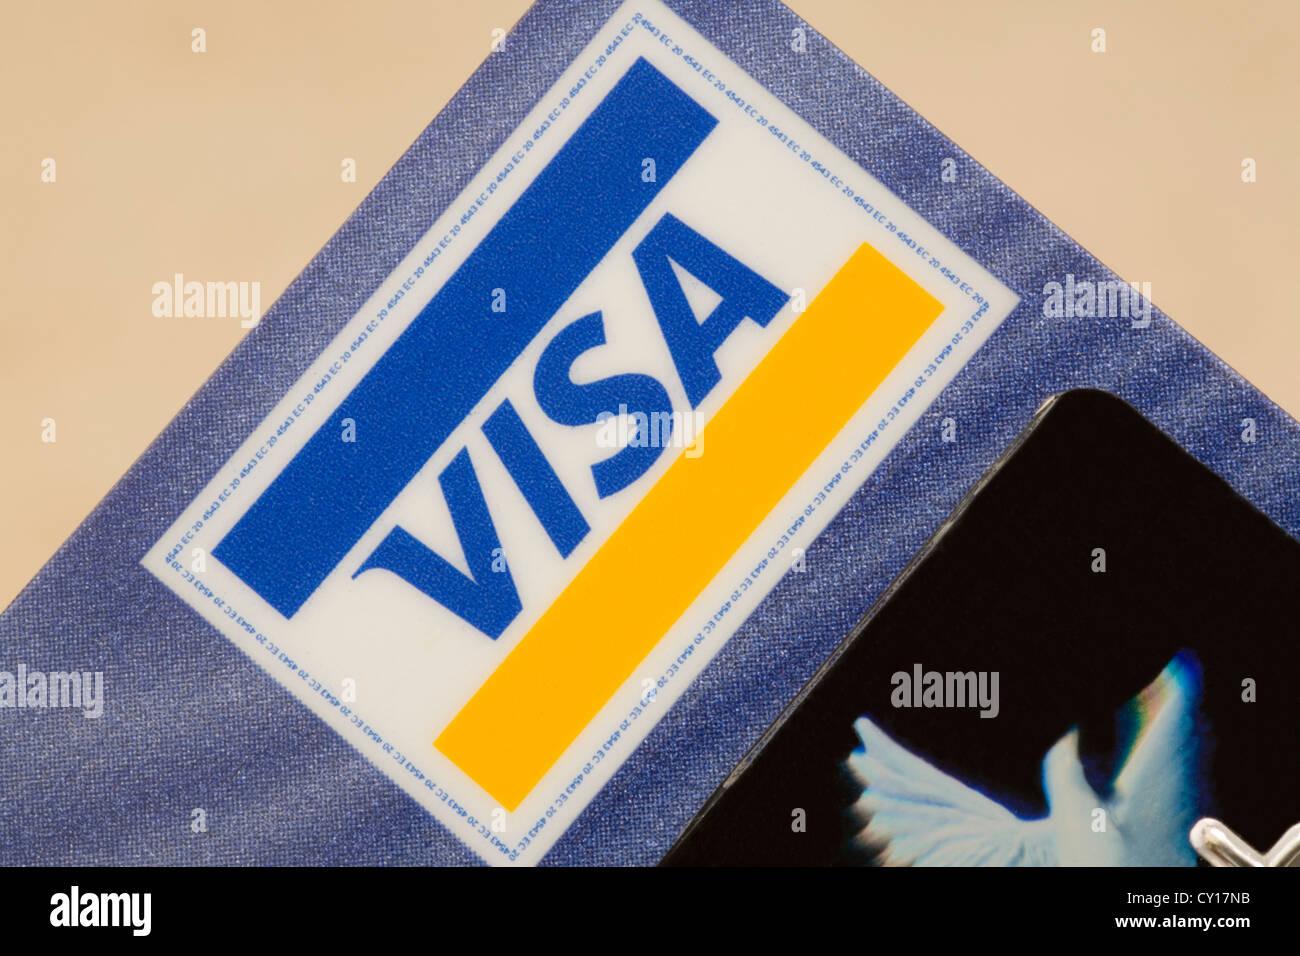 Visa logo sign in close up by hologram on plain background stock visa logo sign in close up by hologram on plain background biocorpaavc Choice Image